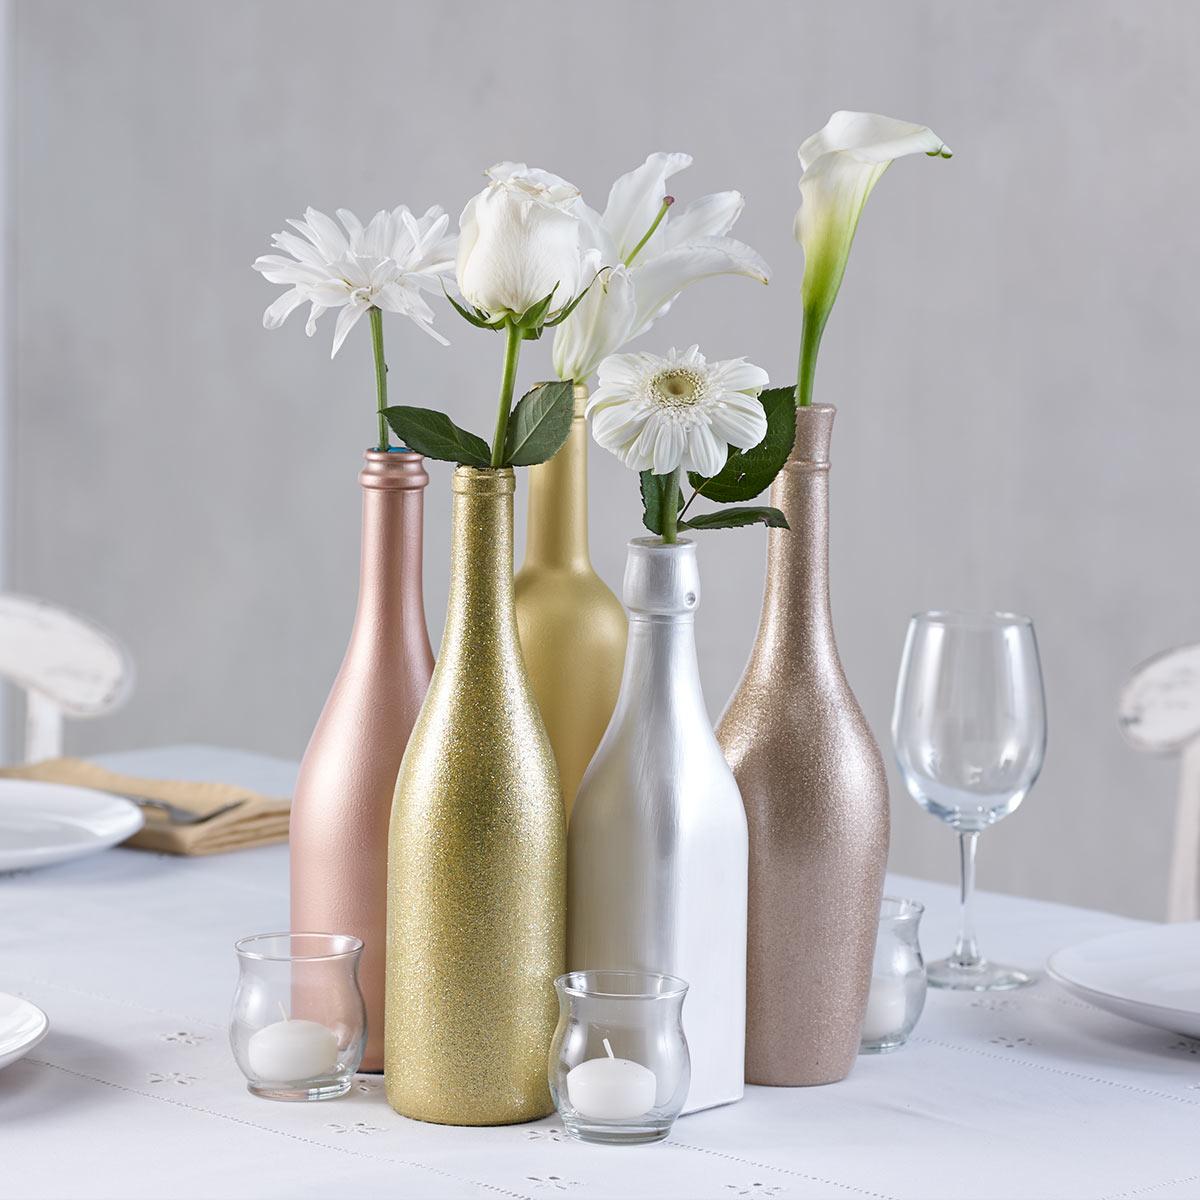 Diy Wedding Centerpiece Metallic Bottles Project Plaid Online